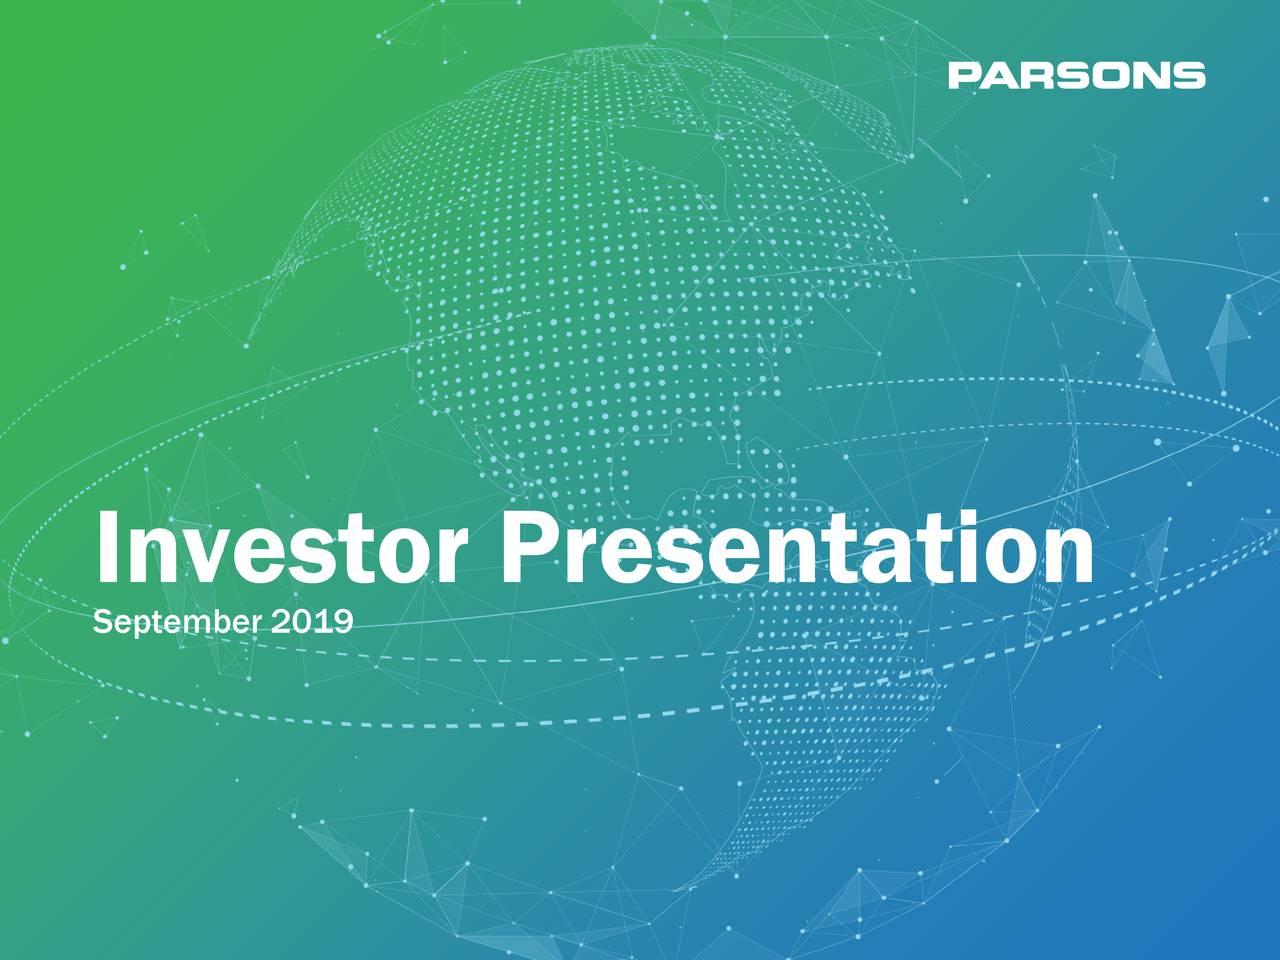 Parsons (PSN) Investor Presentation - Slideshow